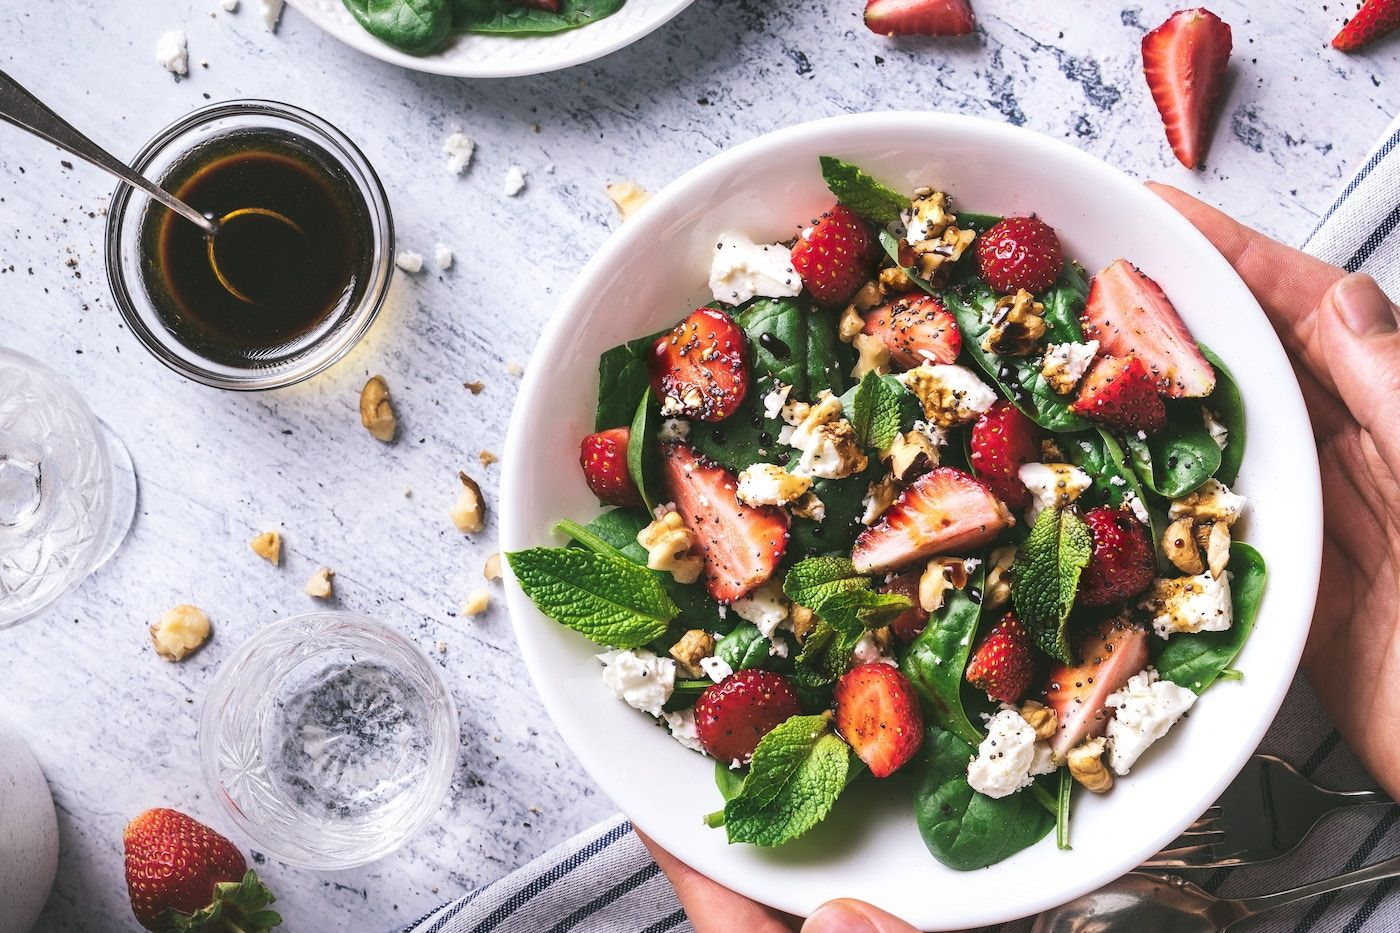 Dr. Weil's anti-inflammatory food list isn't a diet—it's better | Well+Good